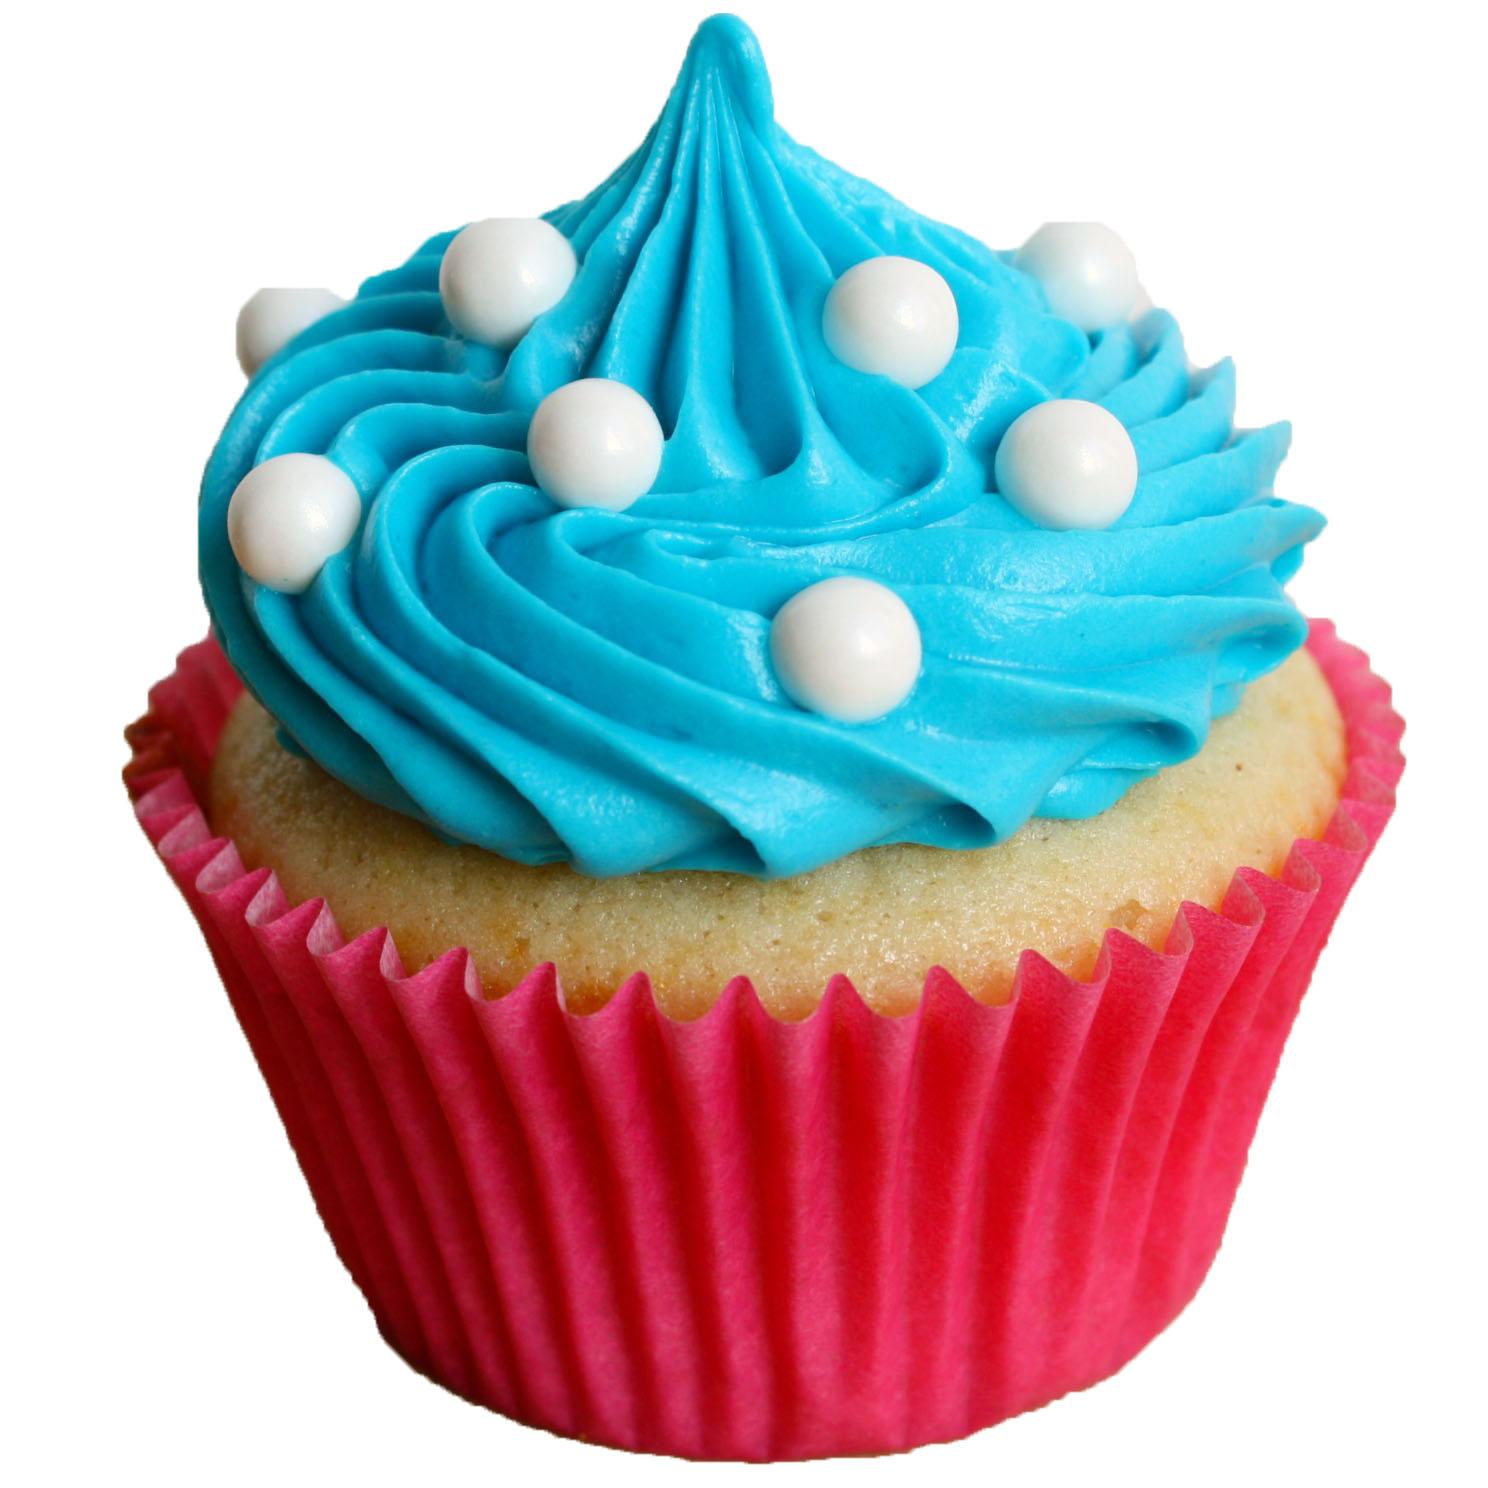 Cupcake PNG HD - 122829